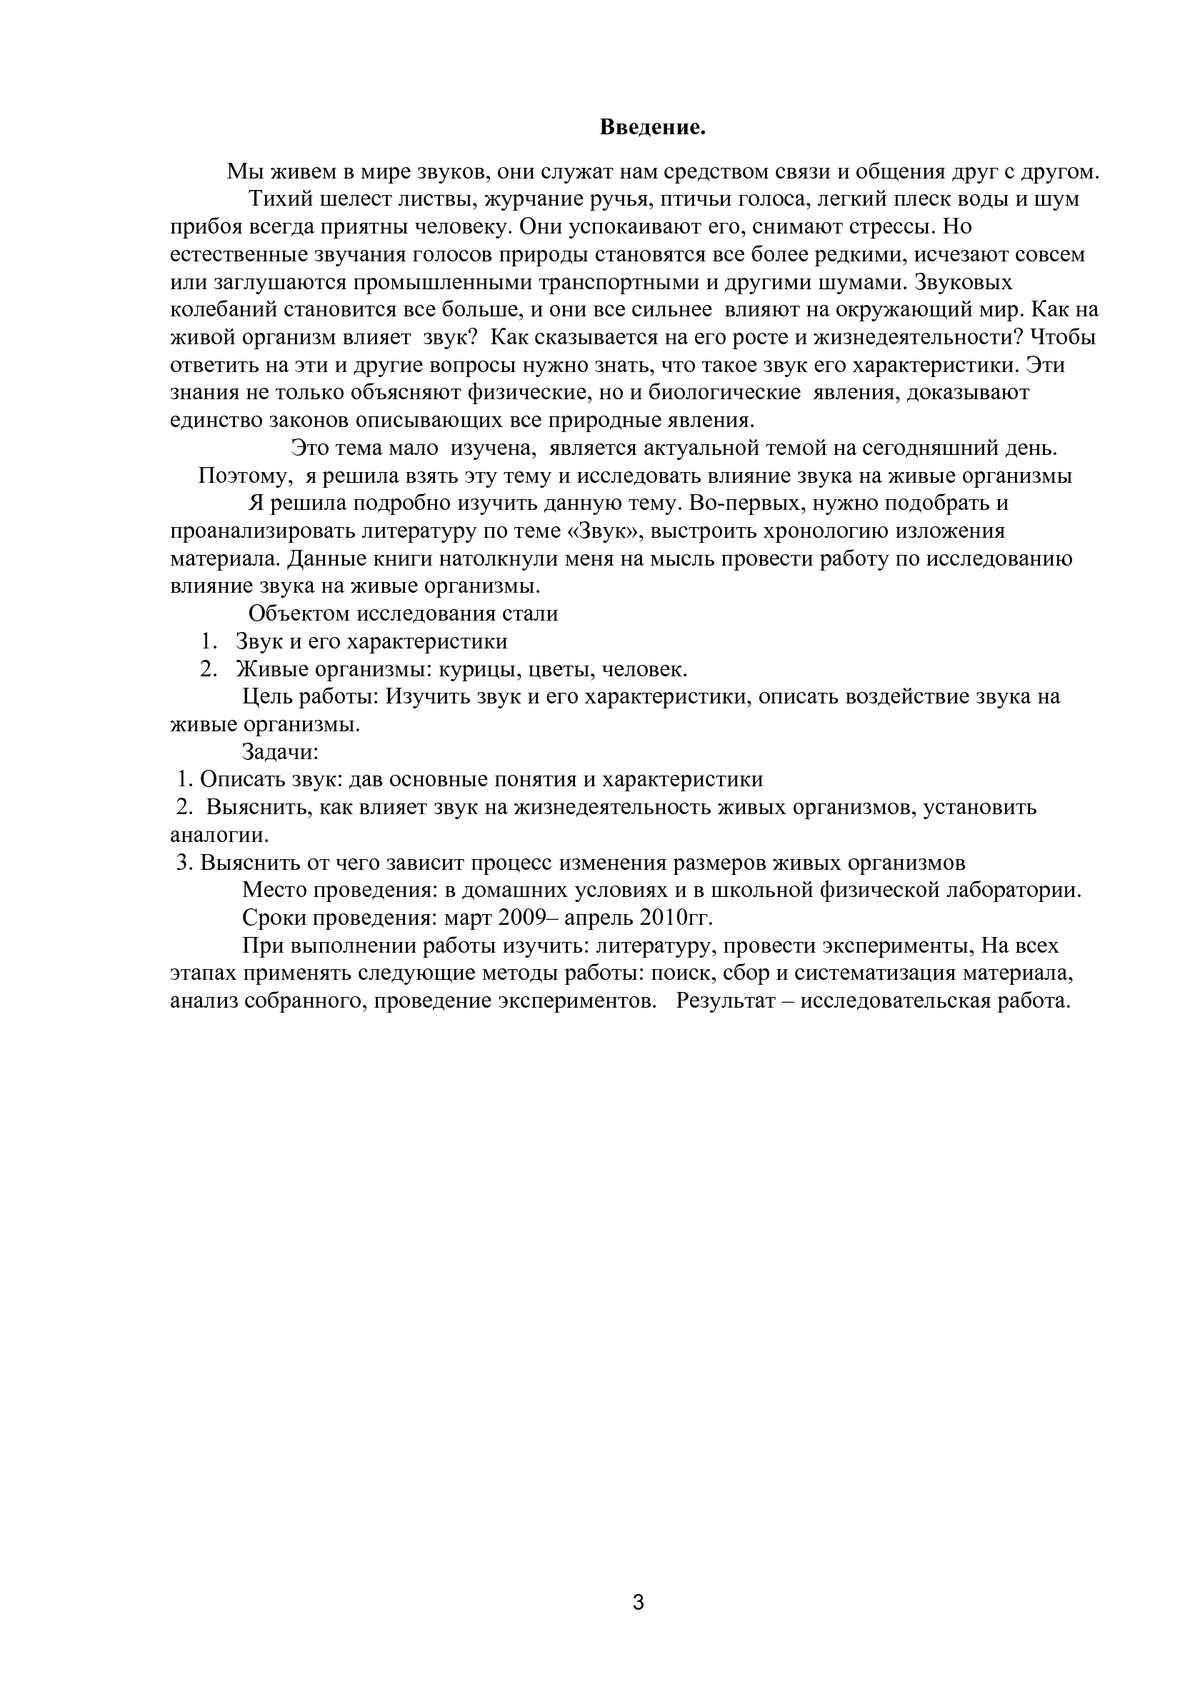 Реферат Звук и его влияние на человека calameo er page 3